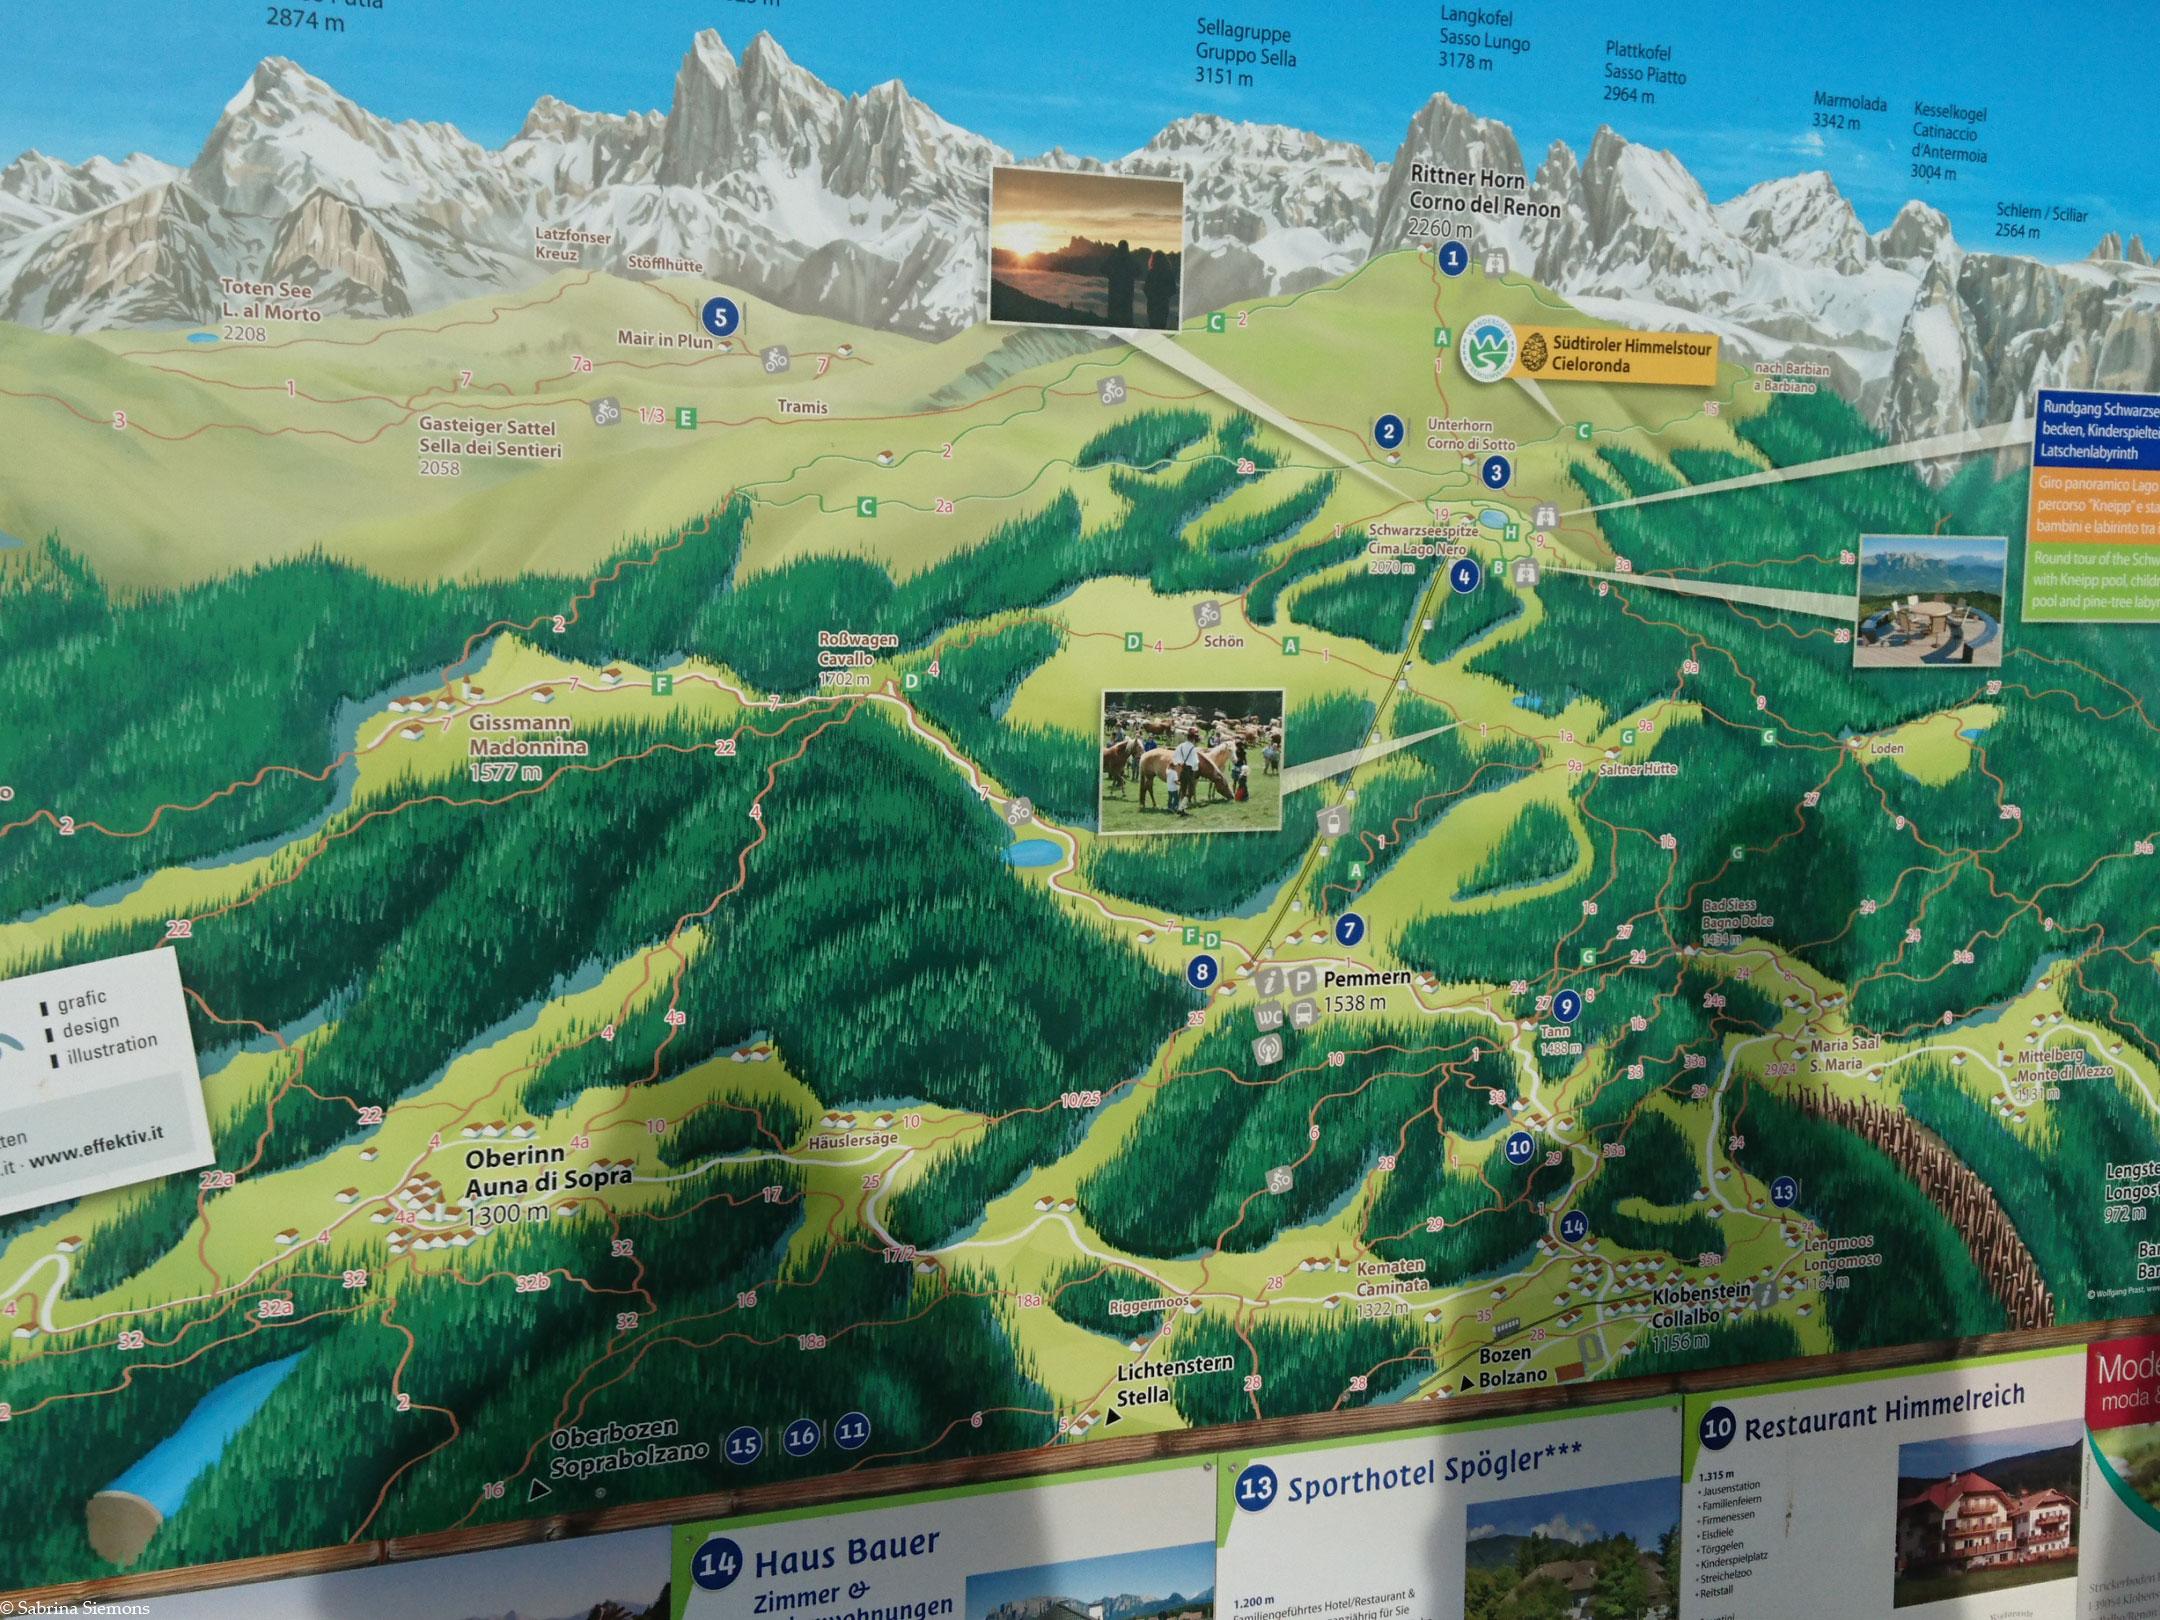 Wheelchair Tours Wheelchair Rittner Horn Hiking Map-1